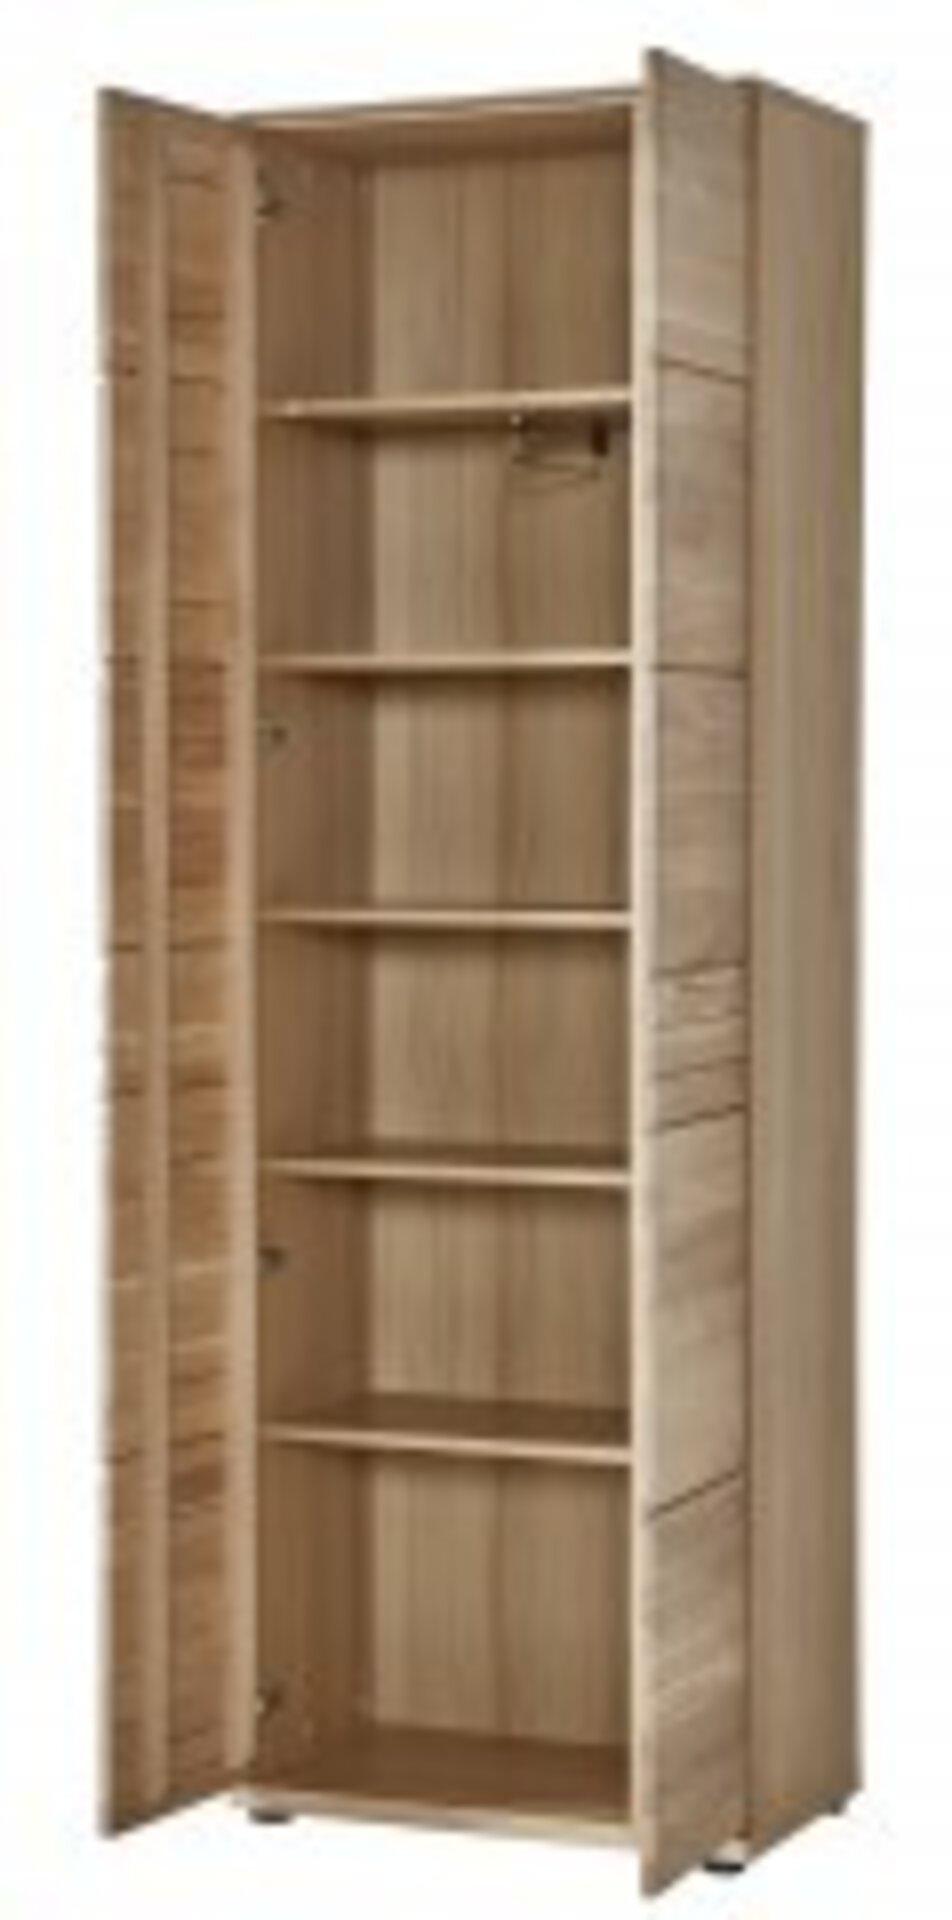 Garderobenschrank ACHAT CELECT Holz